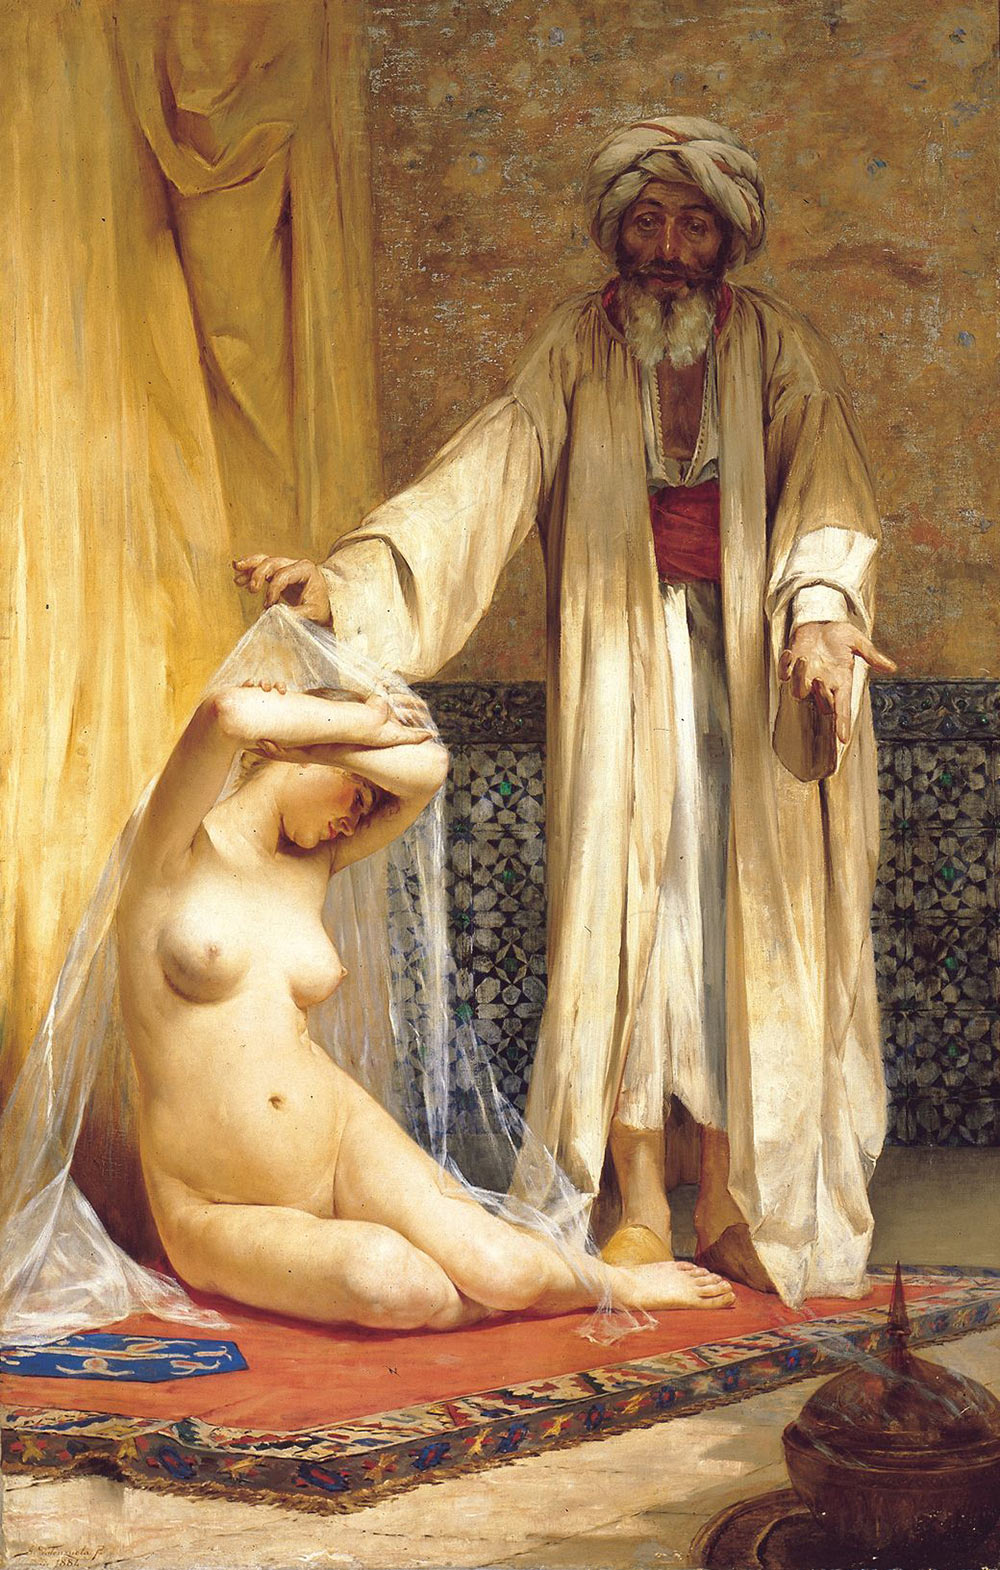 college-bikini-erotic-slave-women-art-straight-and